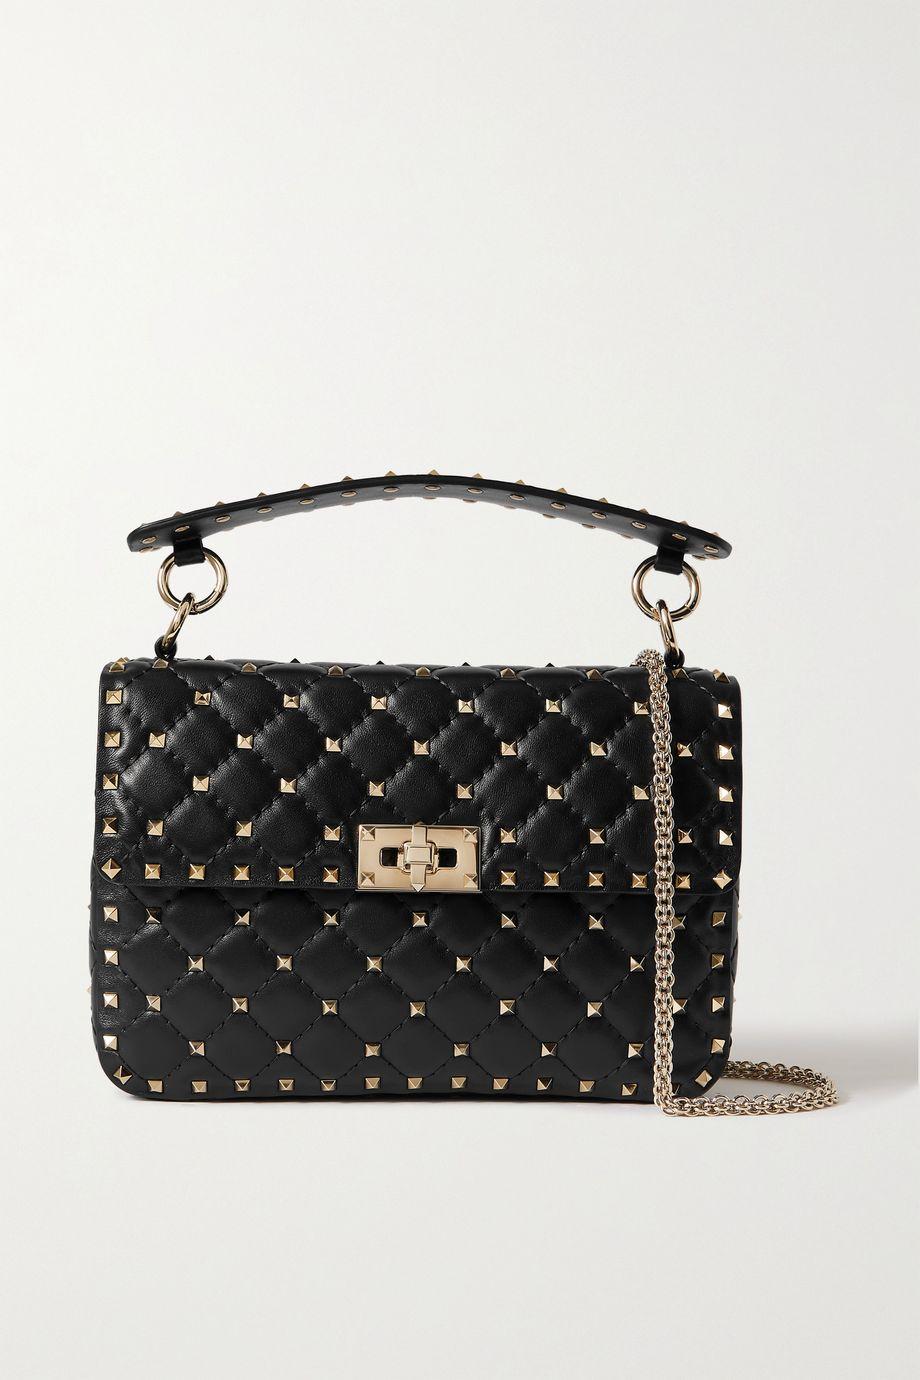 Valentino Valentino Garavani Rockstud Spike small quilted cracked-leather shoulder bag